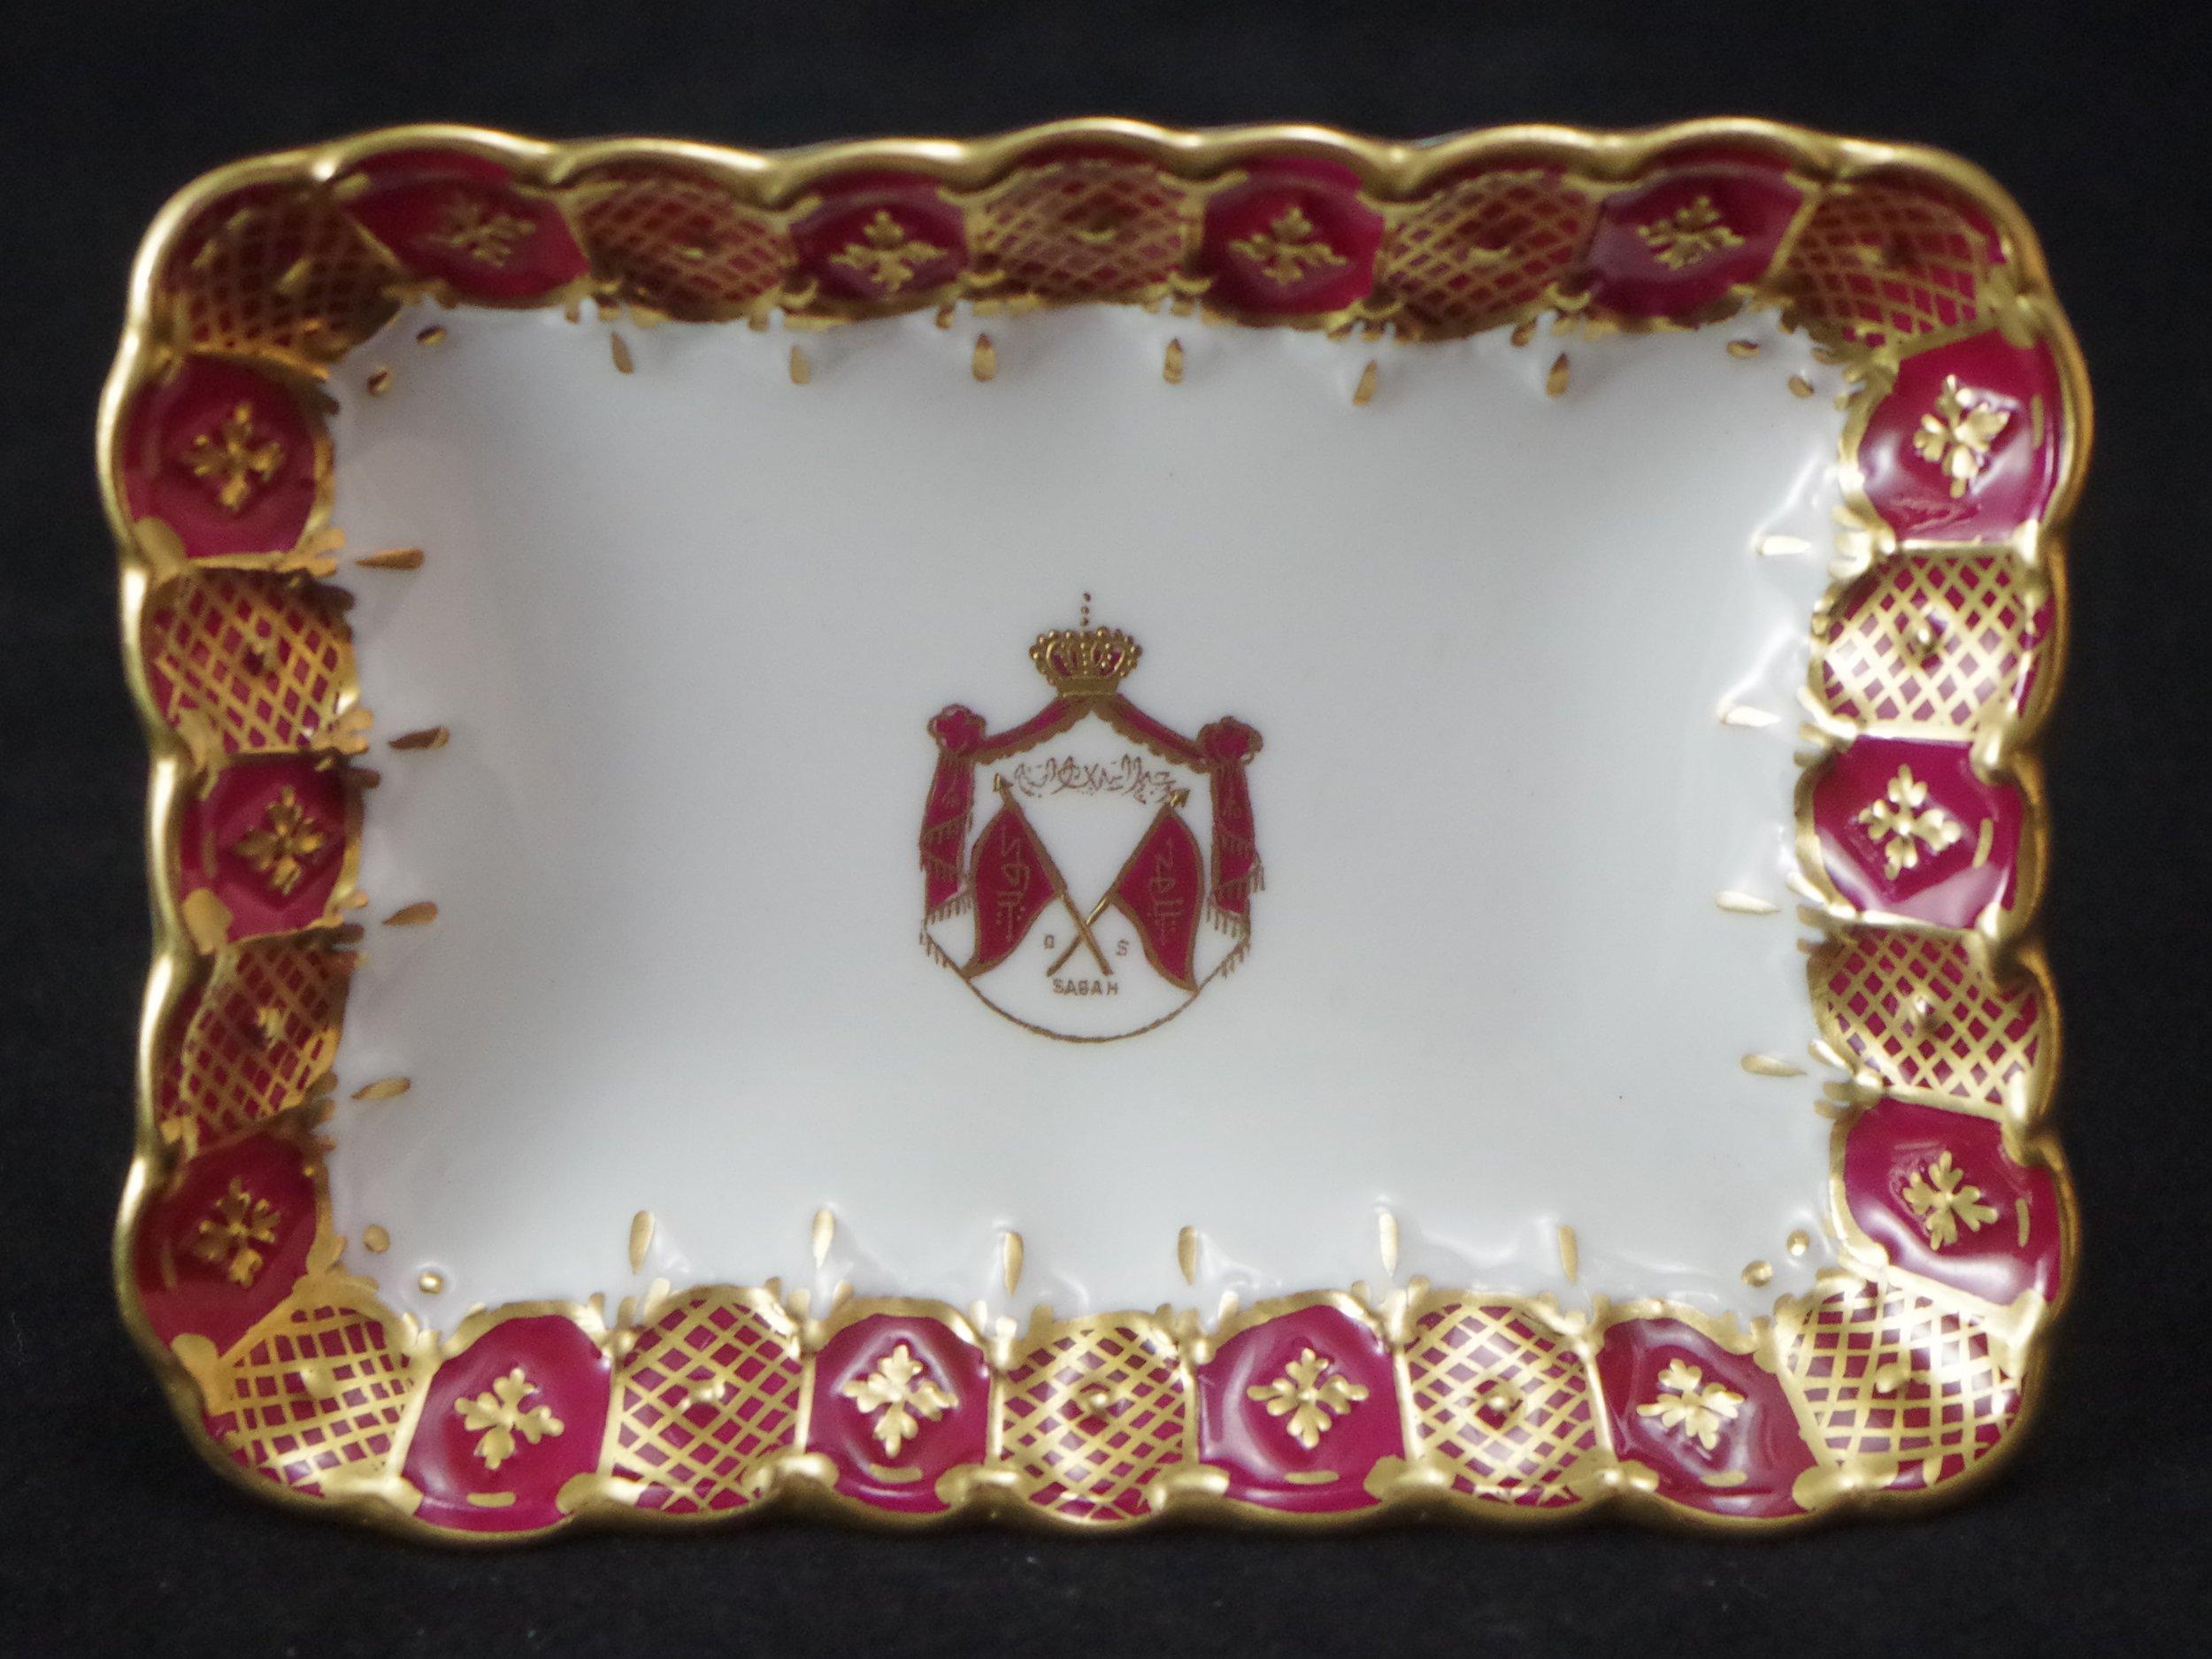 royal-crown-derby-H-E-Sheikh-Duaij-Salman-Al-Sabah-oblong-heraldic-tray